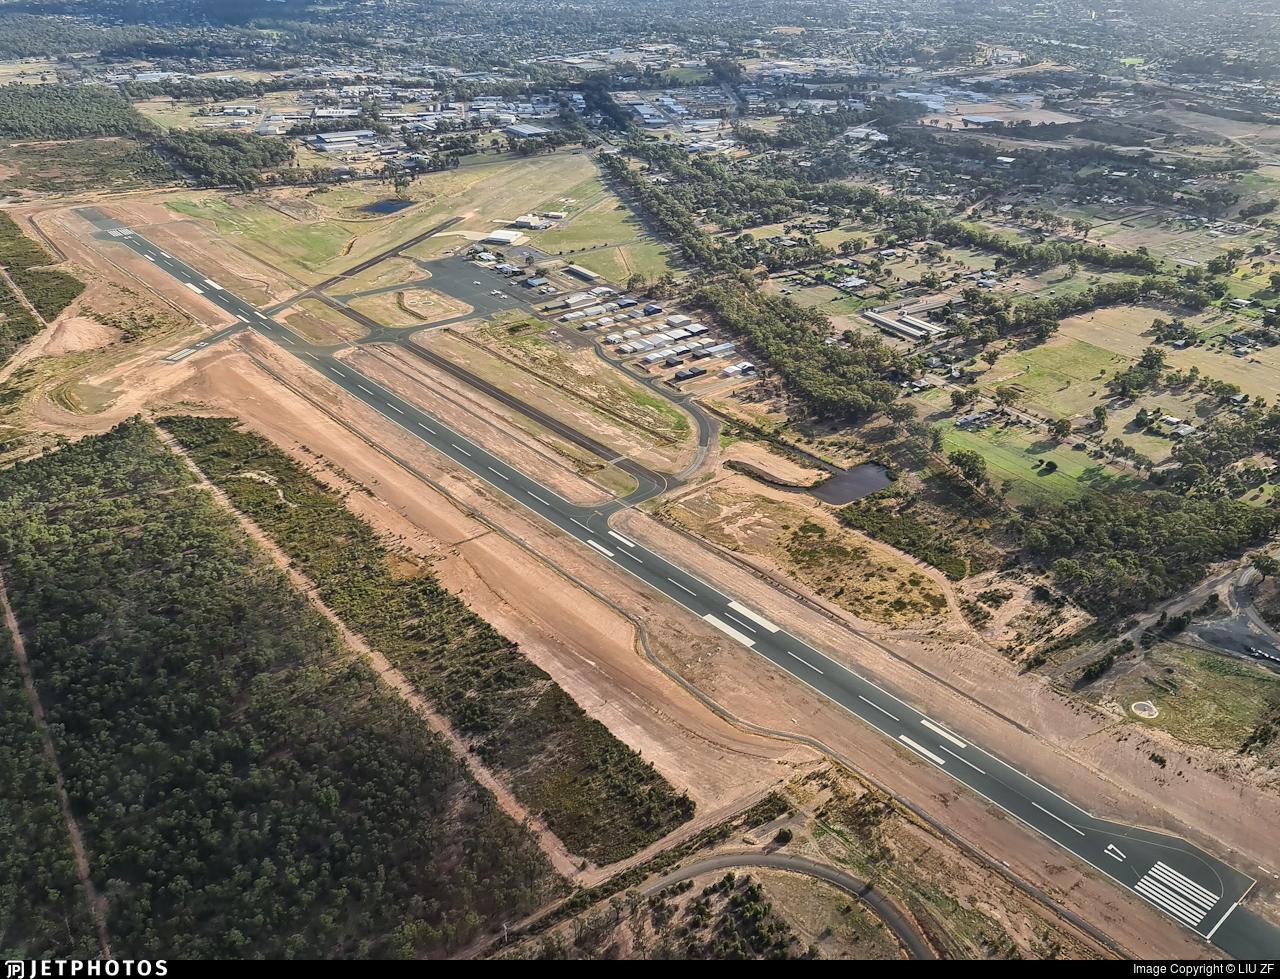 YBDG - Airport - Airport Overview